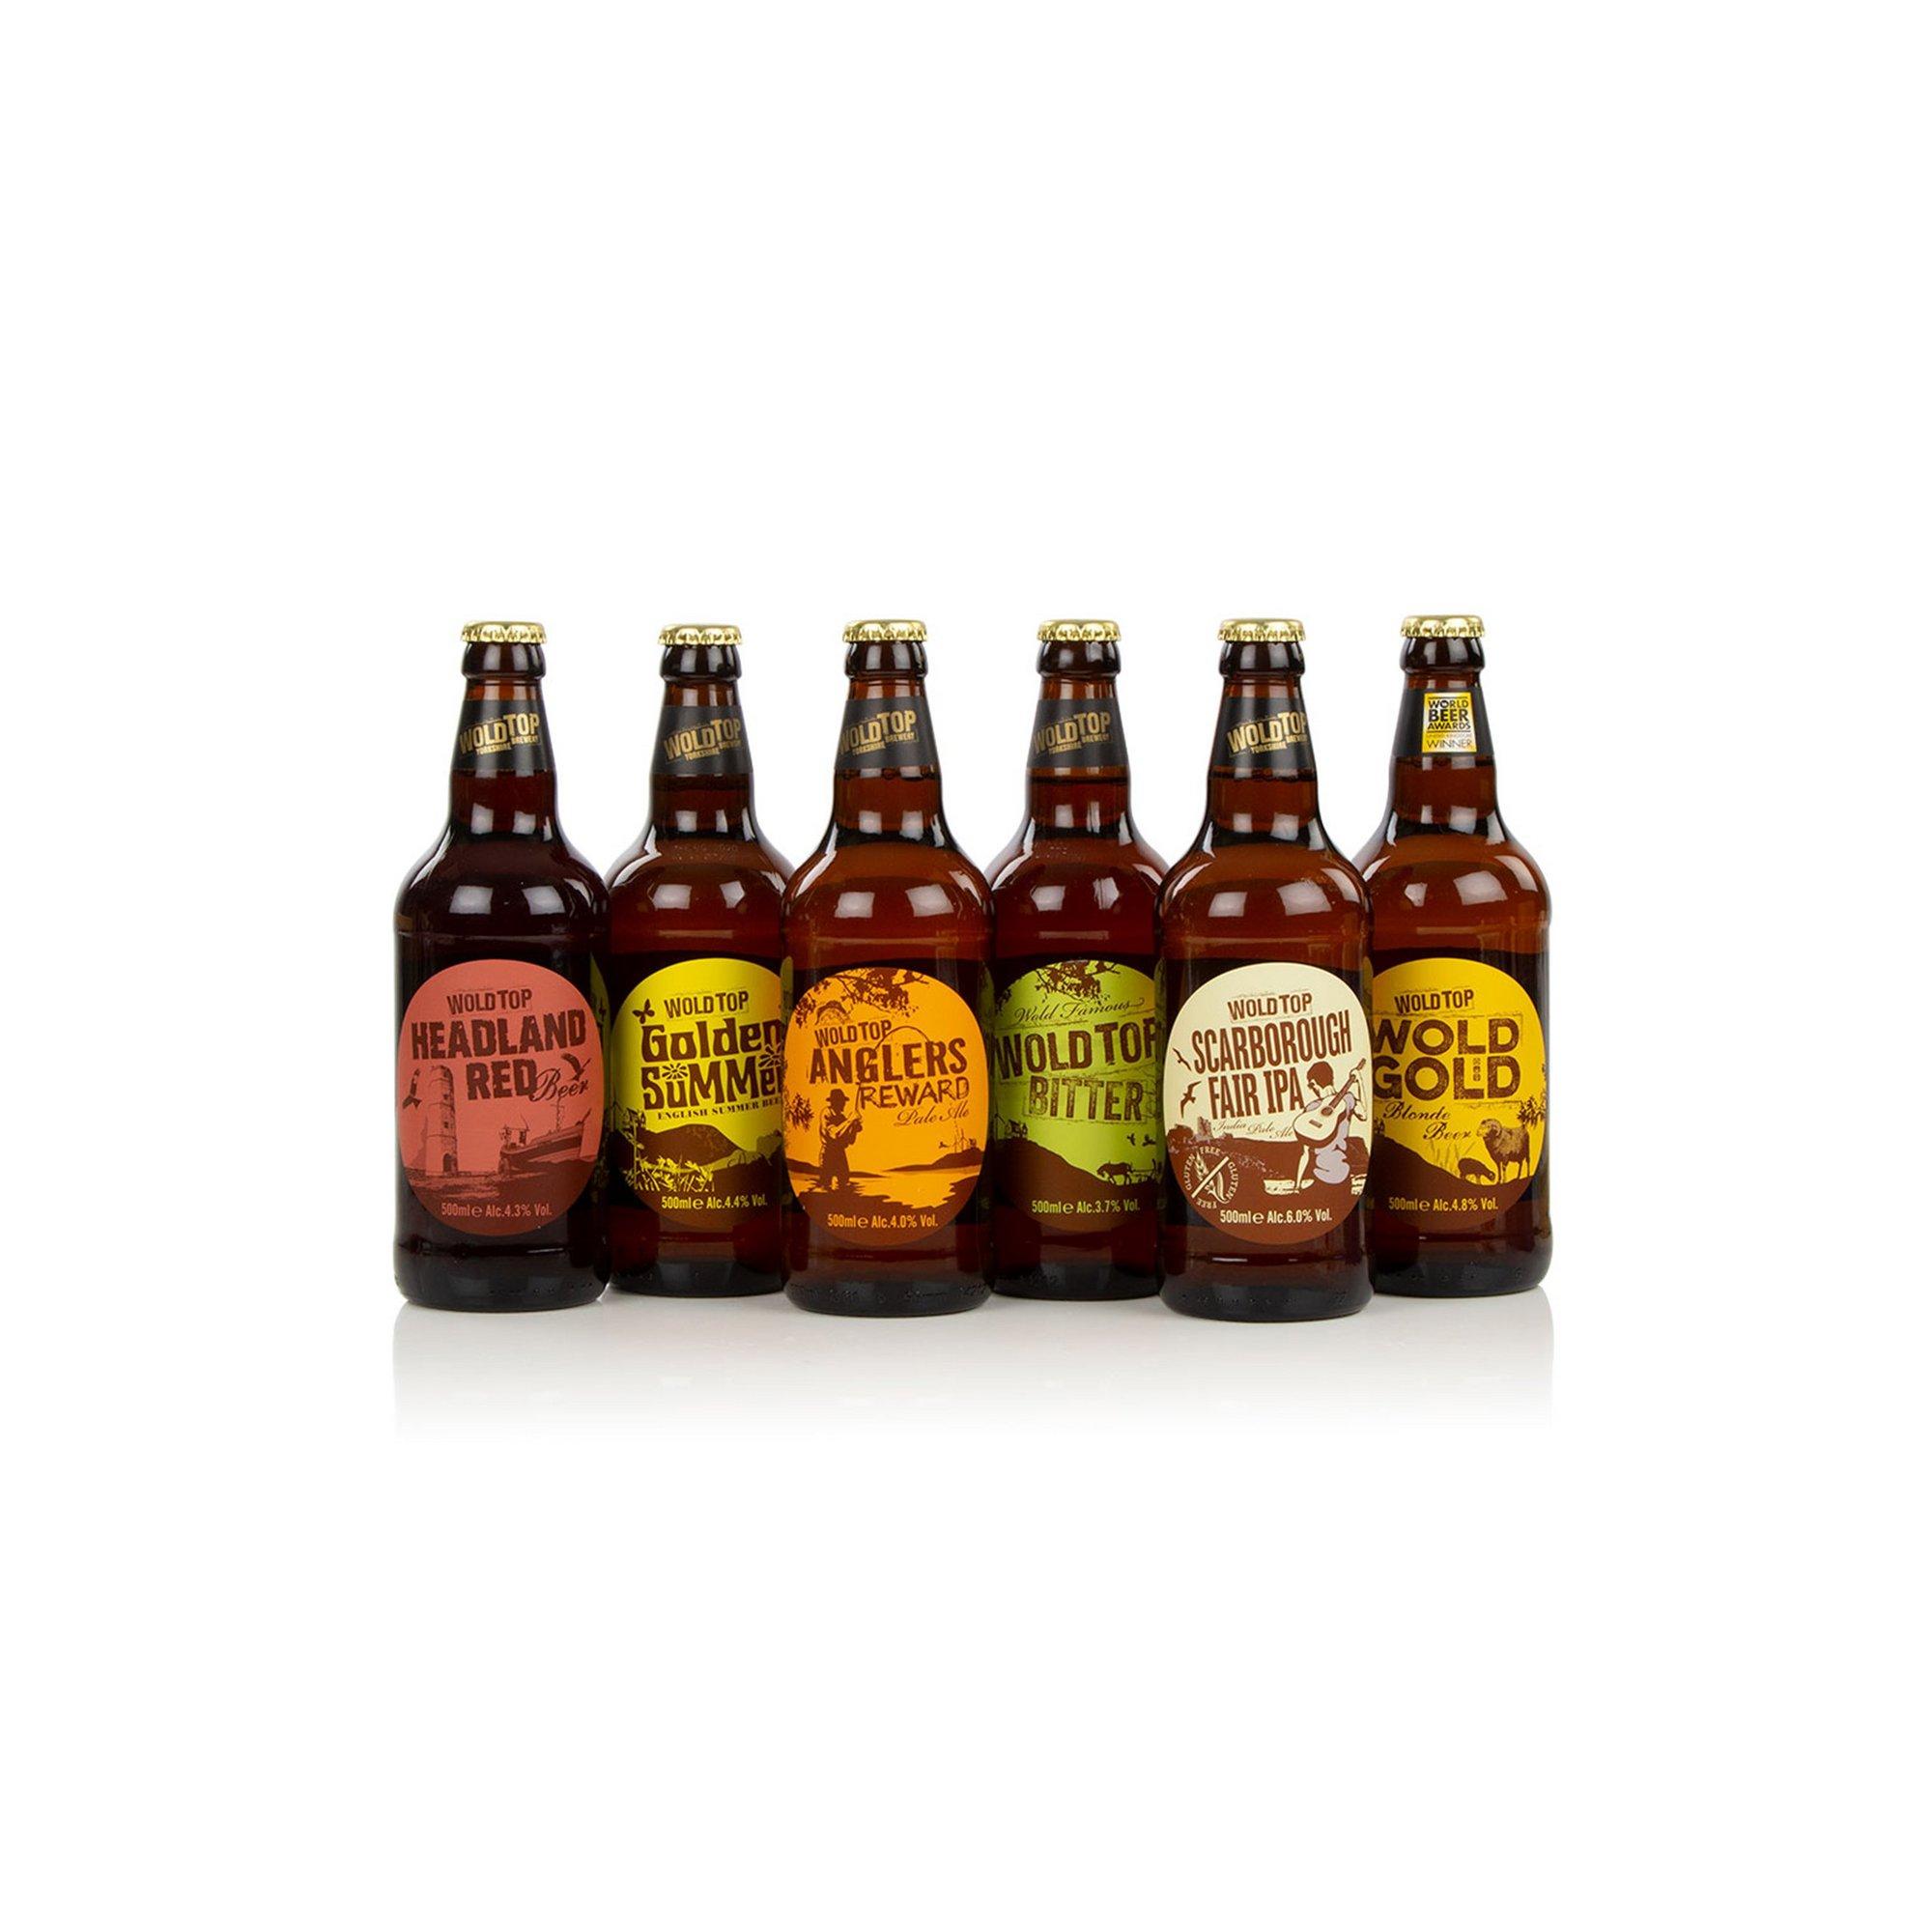 Image of Beer Lovers Case